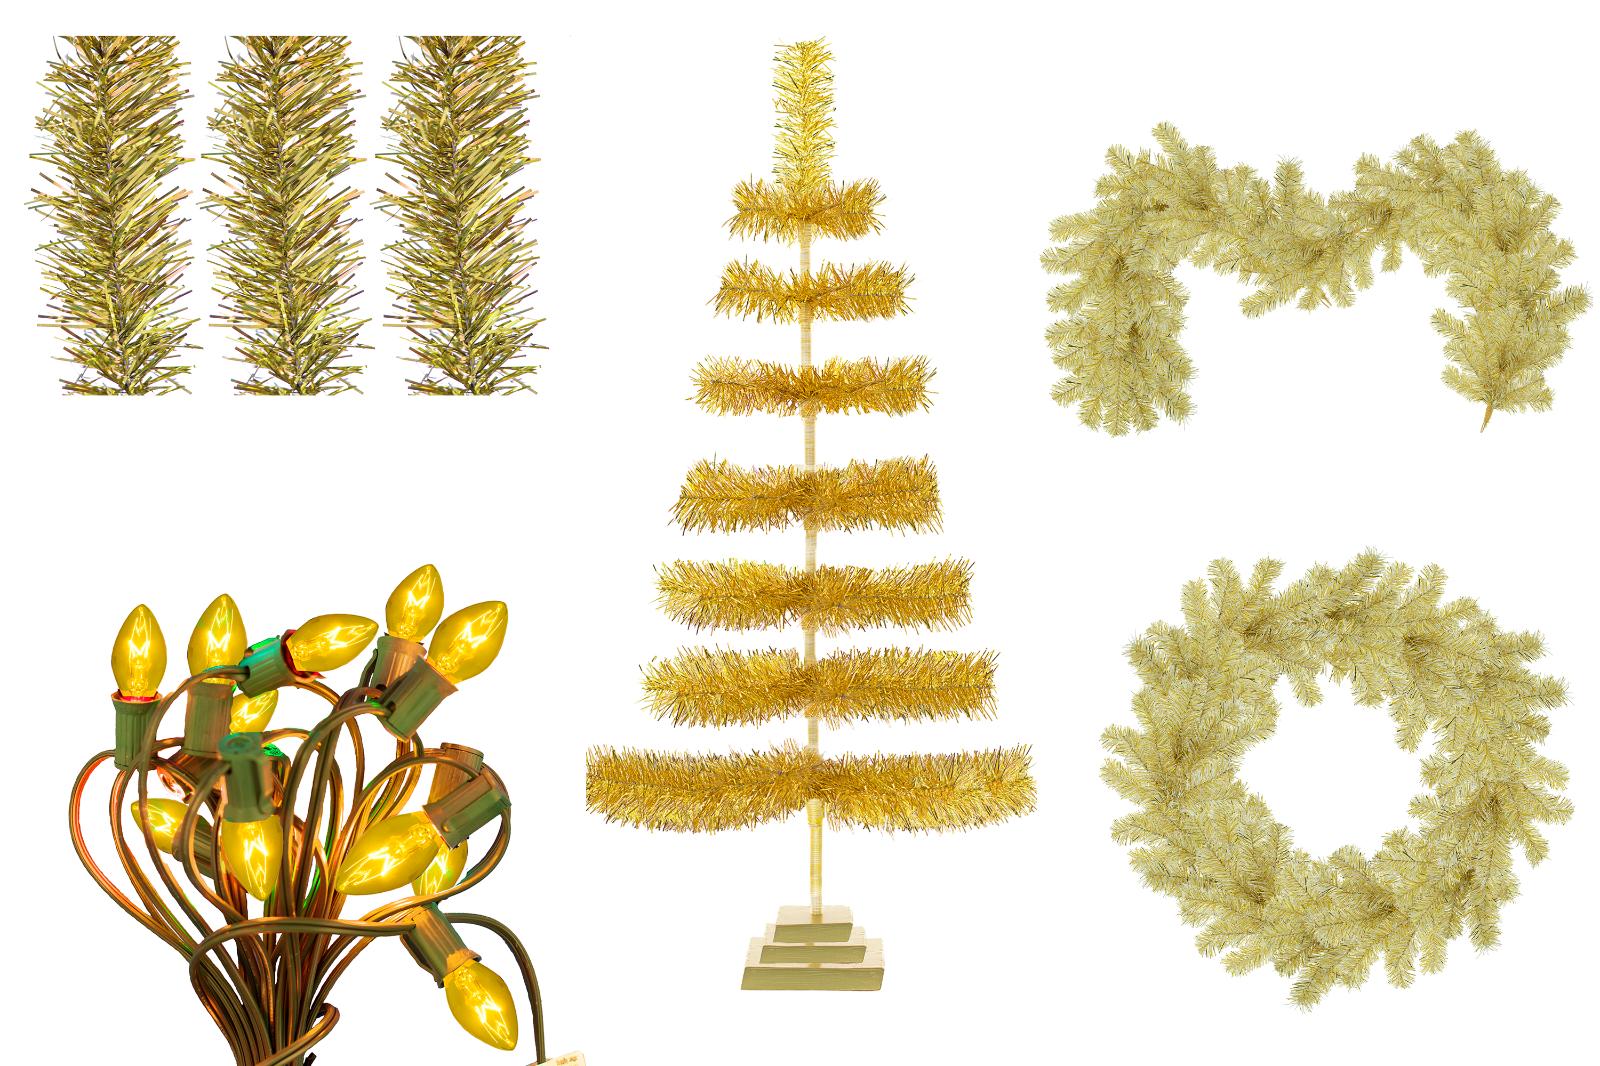 Gold Christmas Decoration Bundle Kit 3FT Tree, Garland, Wreath, Lights, Tinsel